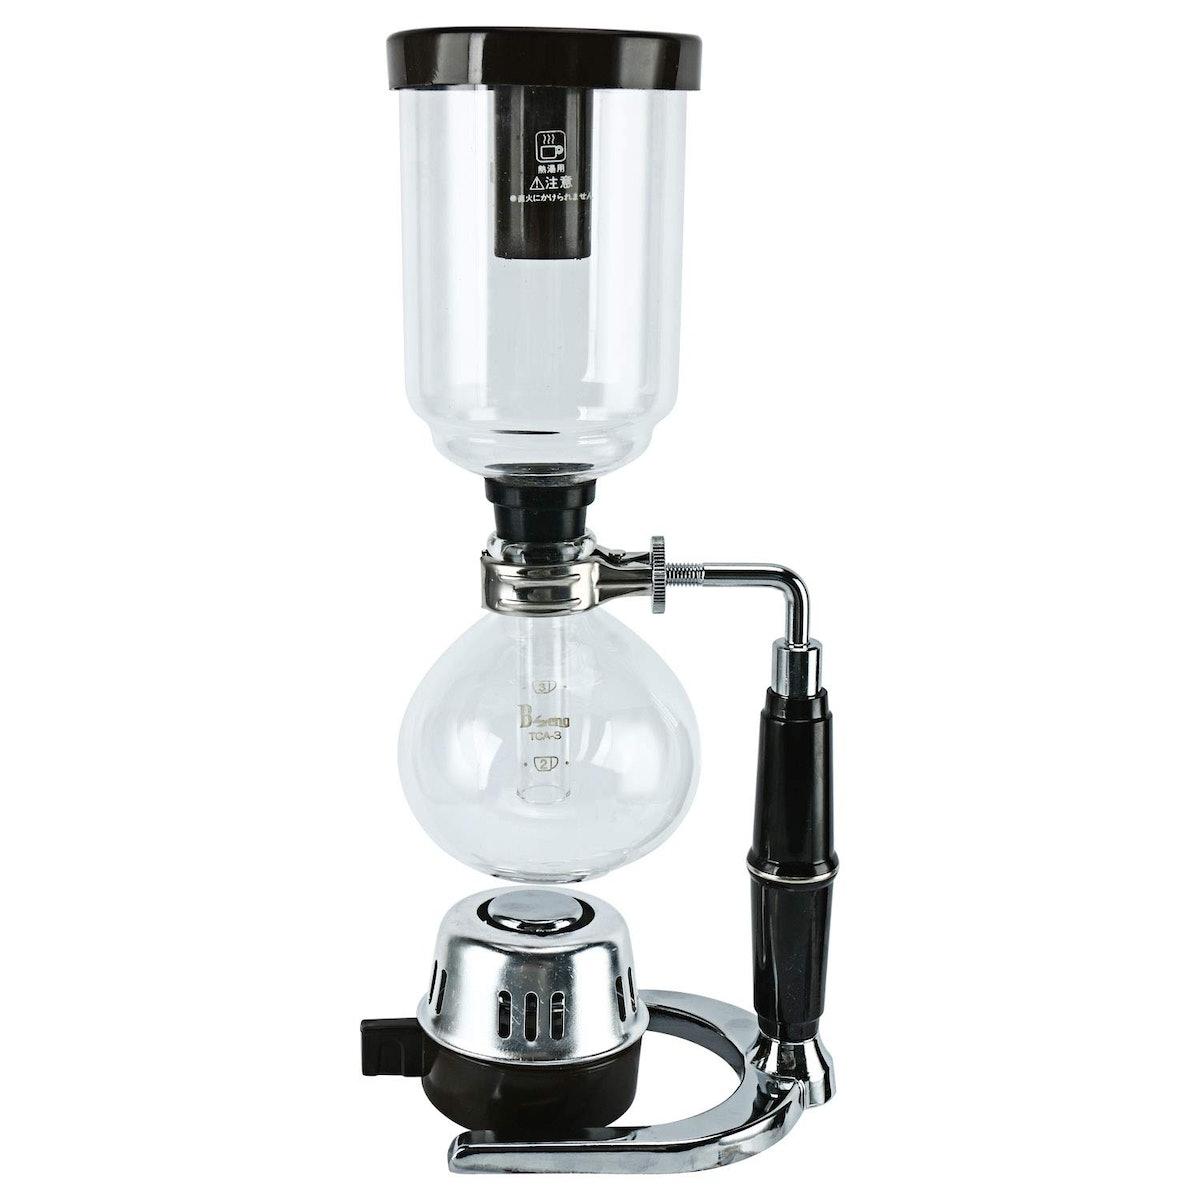 Boeng Tabletop Siphon Coffee Maker